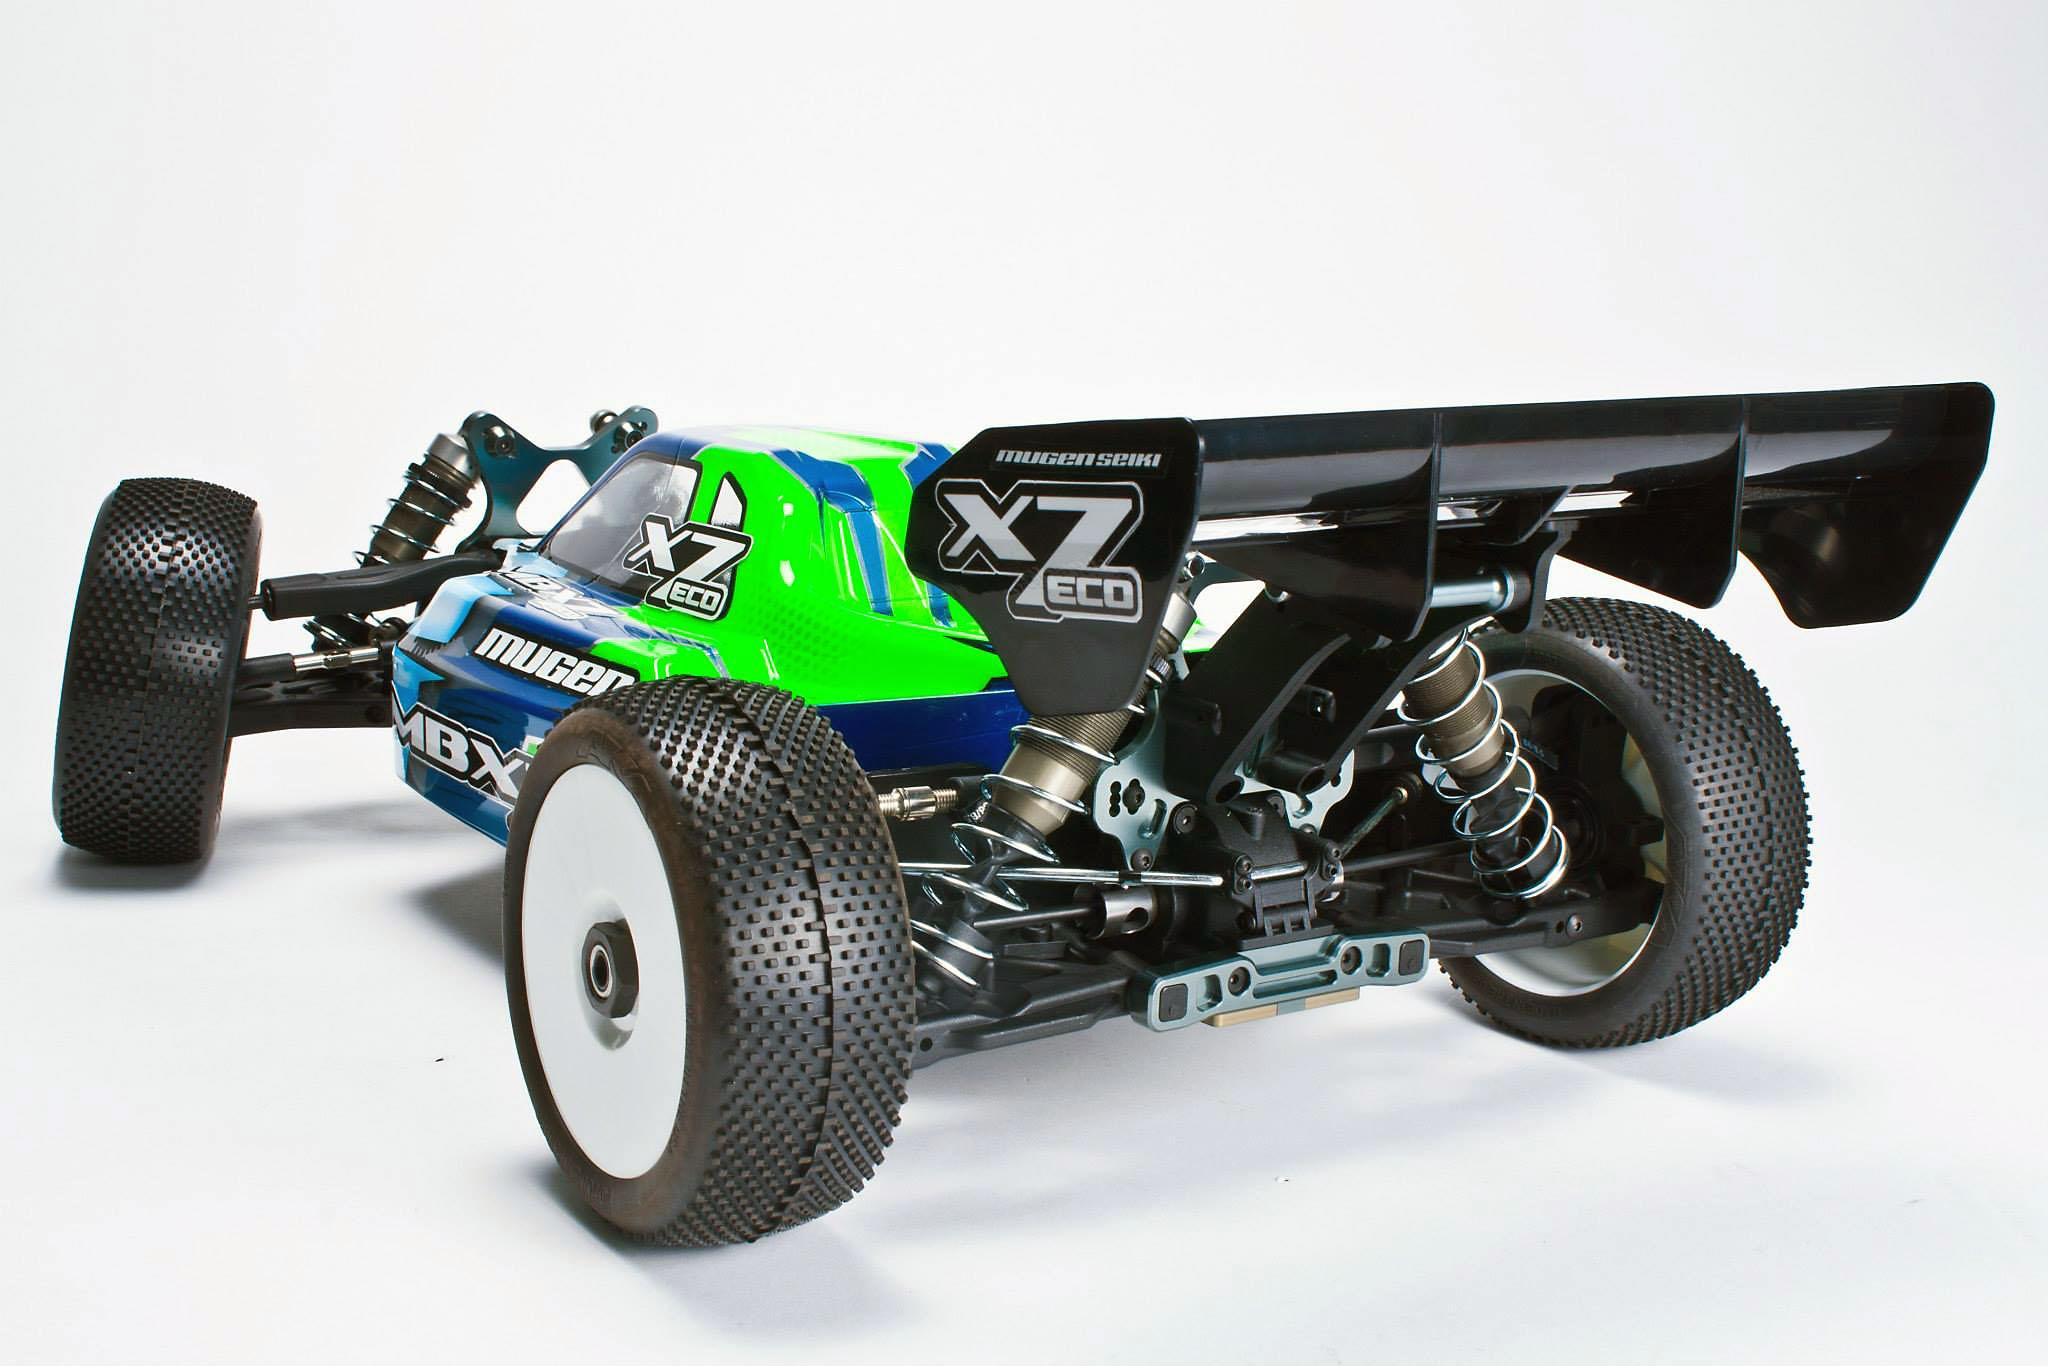 Mugen Seiki Mbx7 Eco